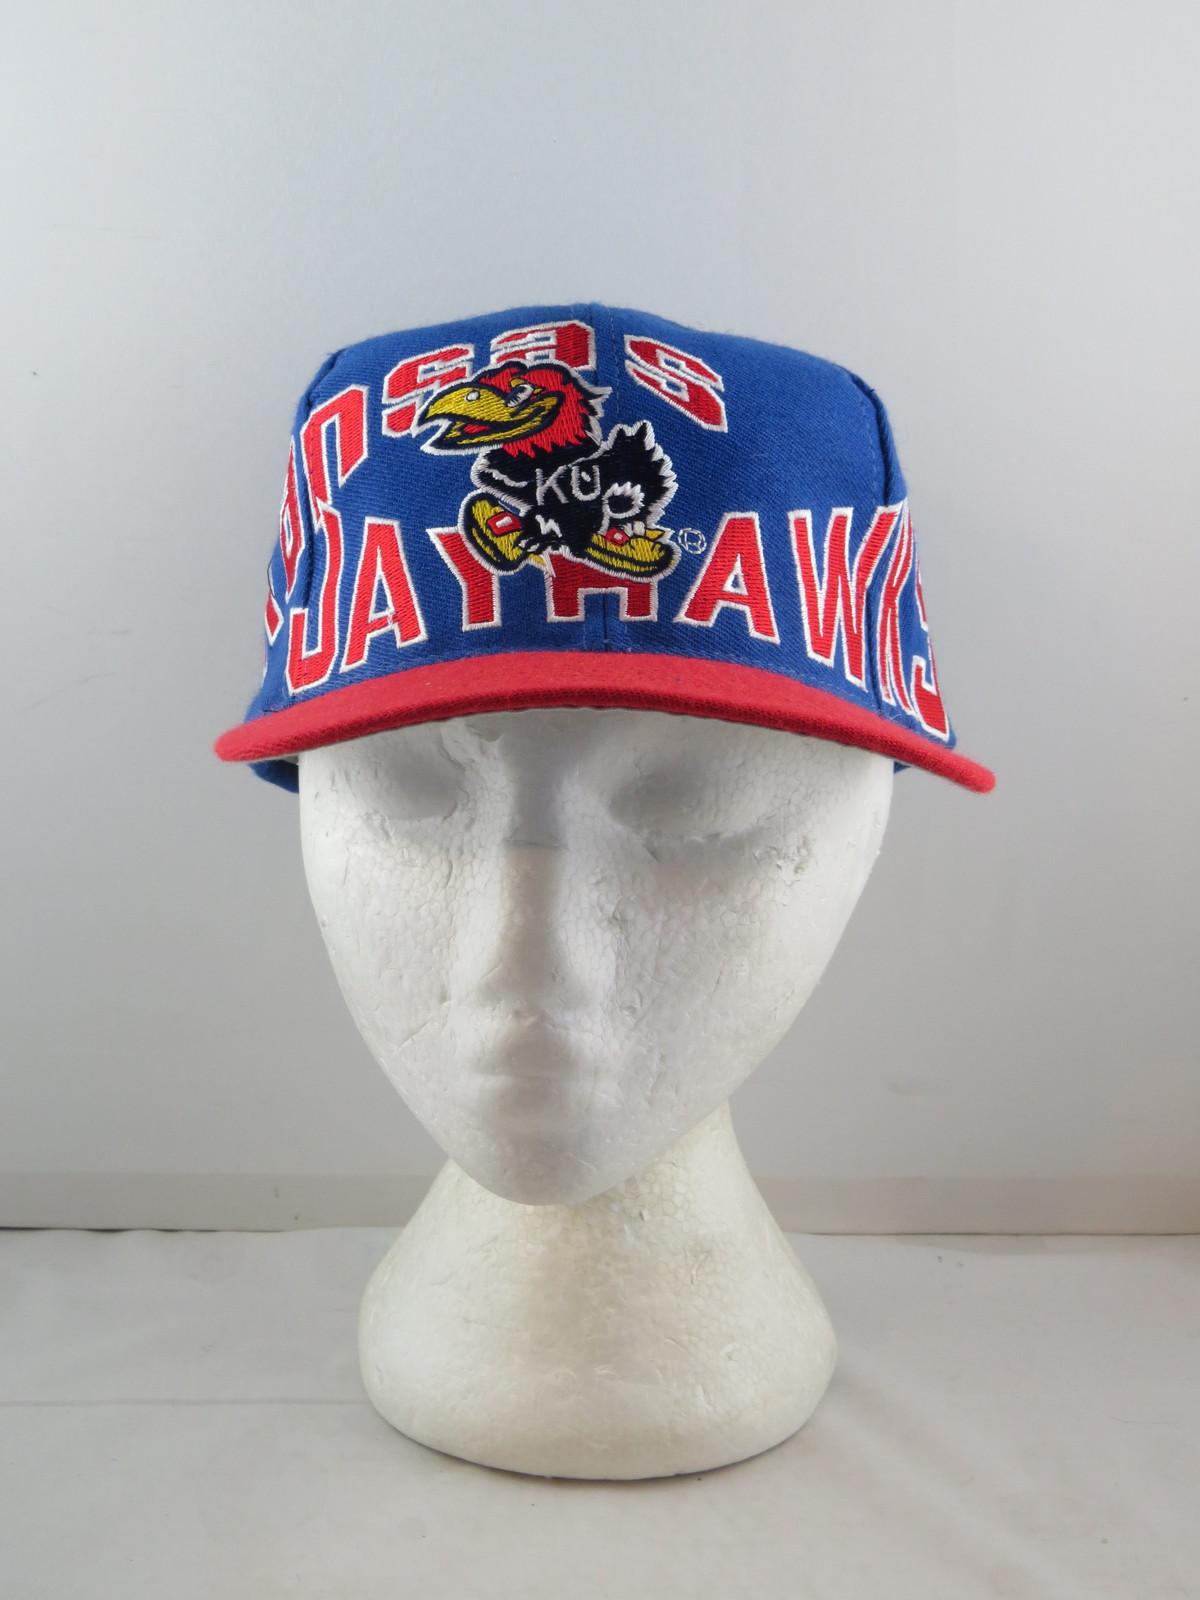 Kansas Jayhawks Hat (VTG) - Oversize Script by Apex One - Adult Snapback